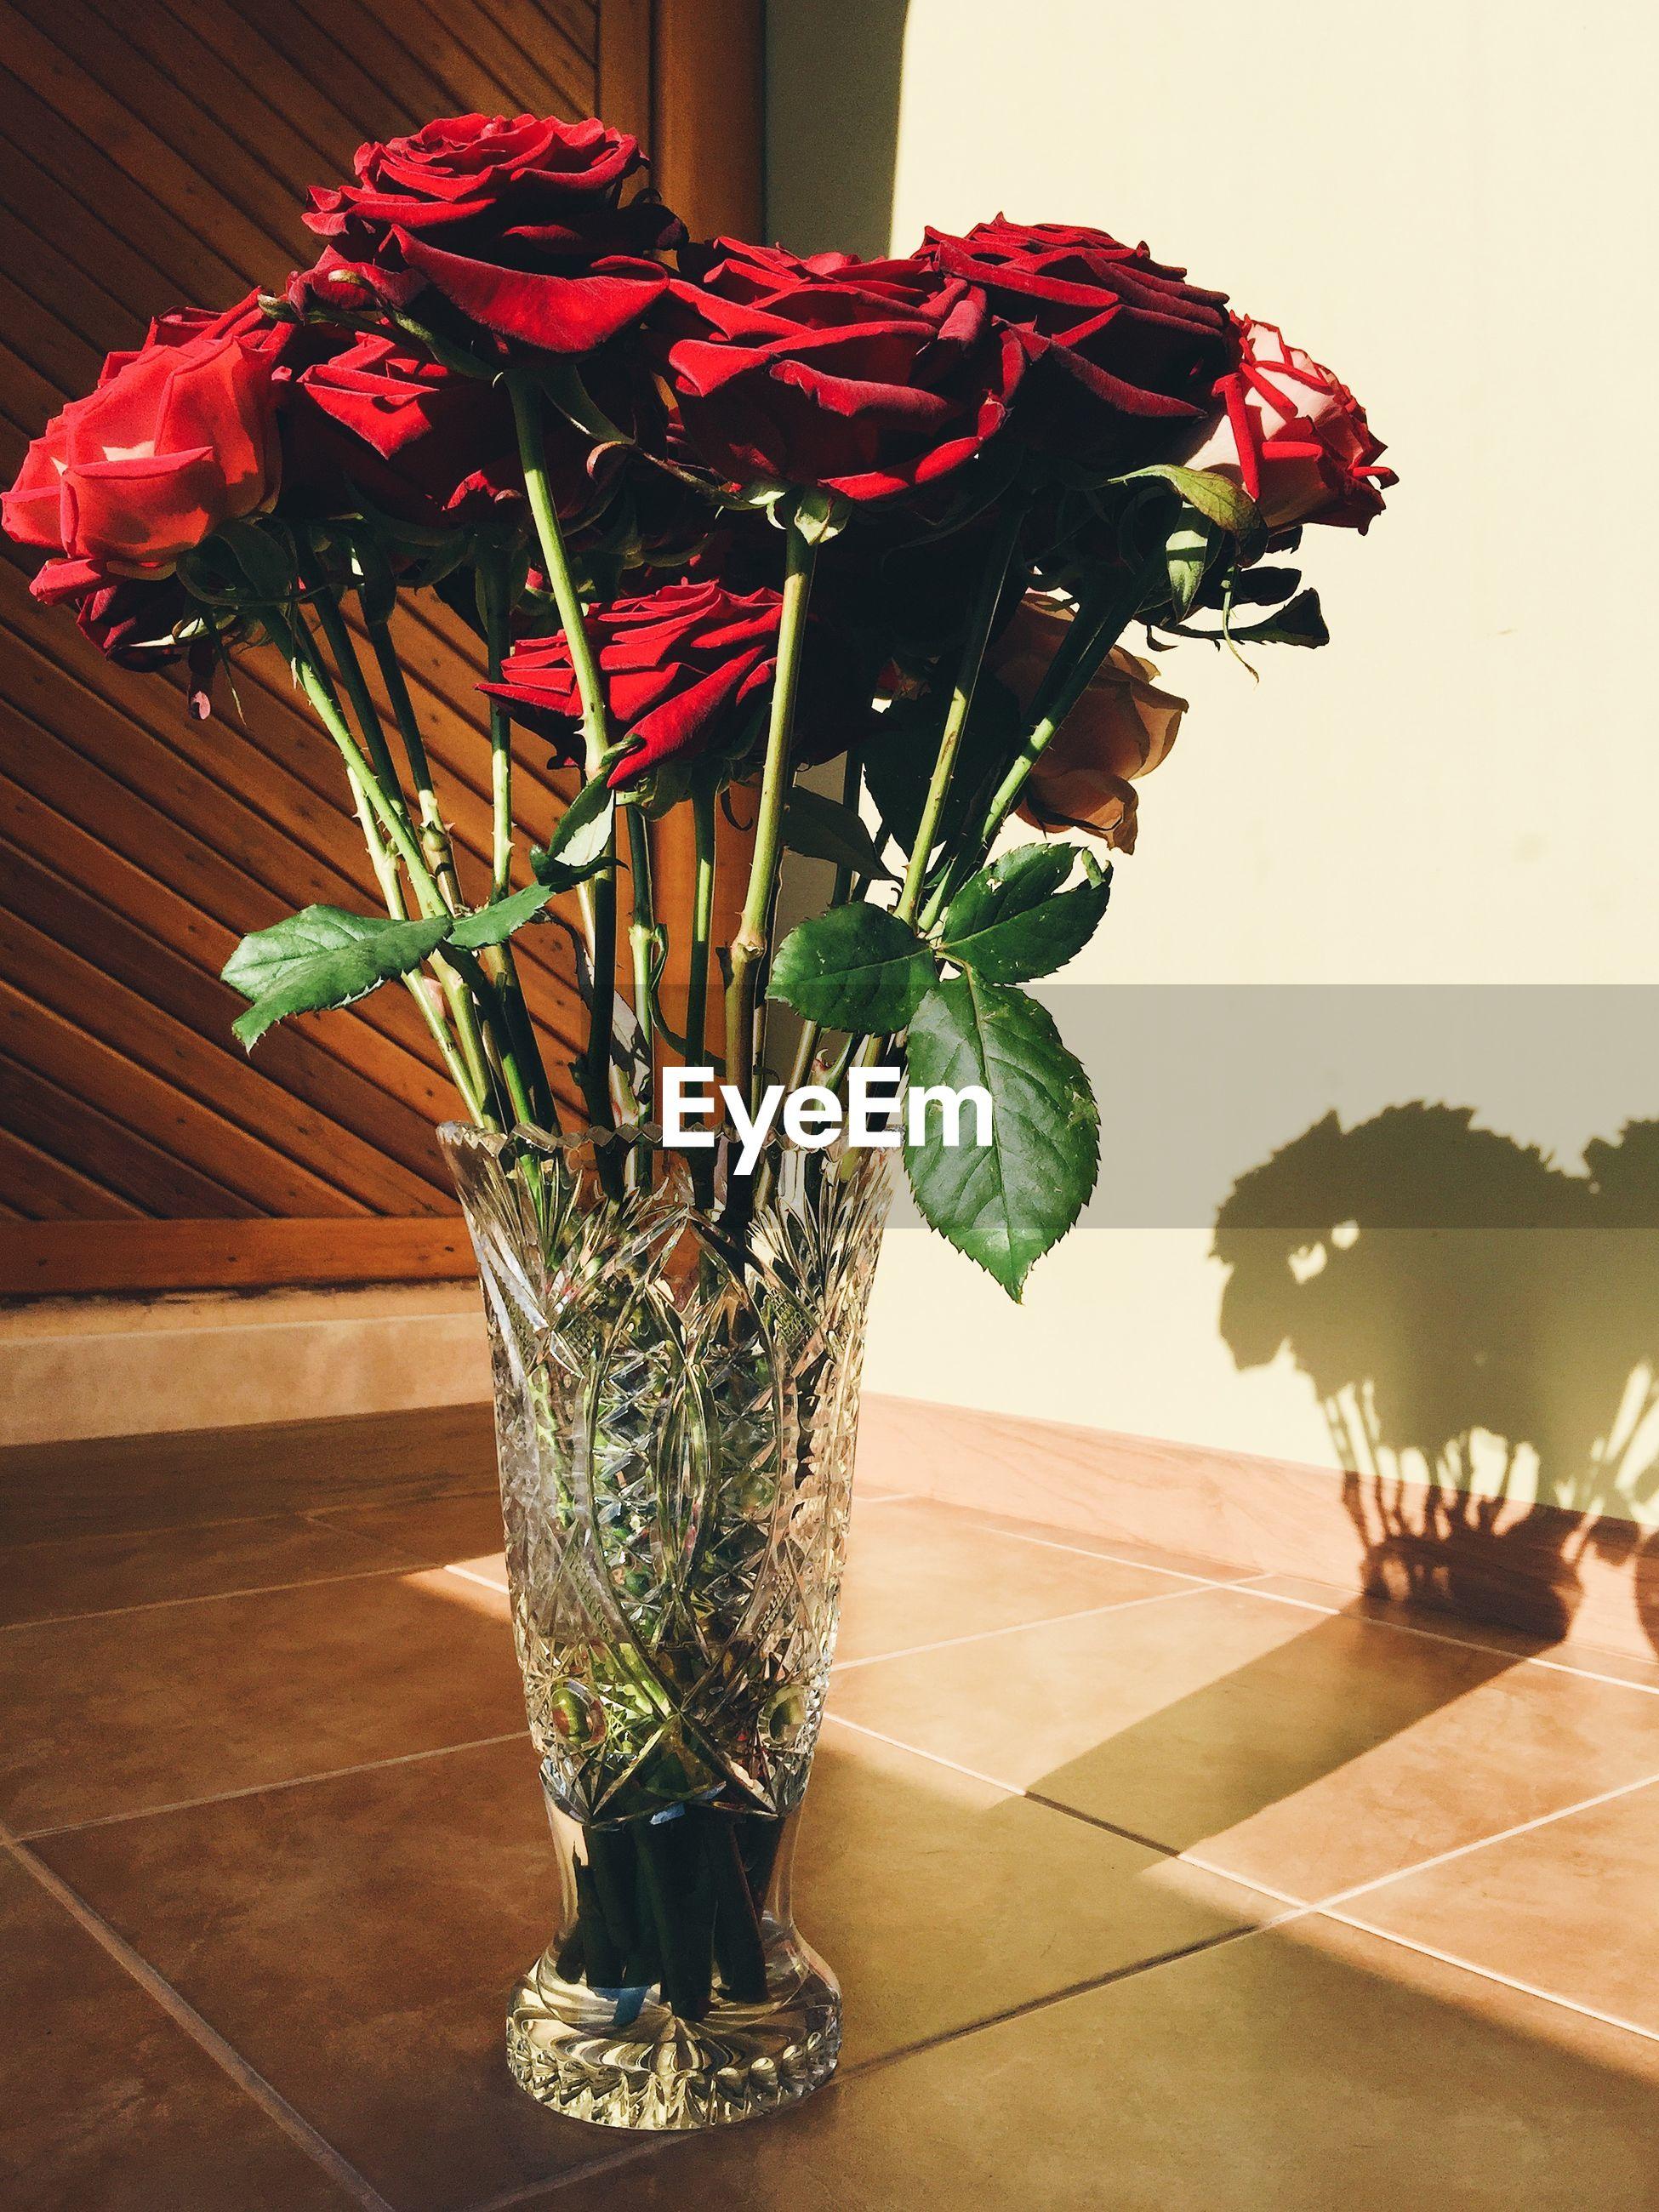 Sunlight falling on rose vase on floor at home